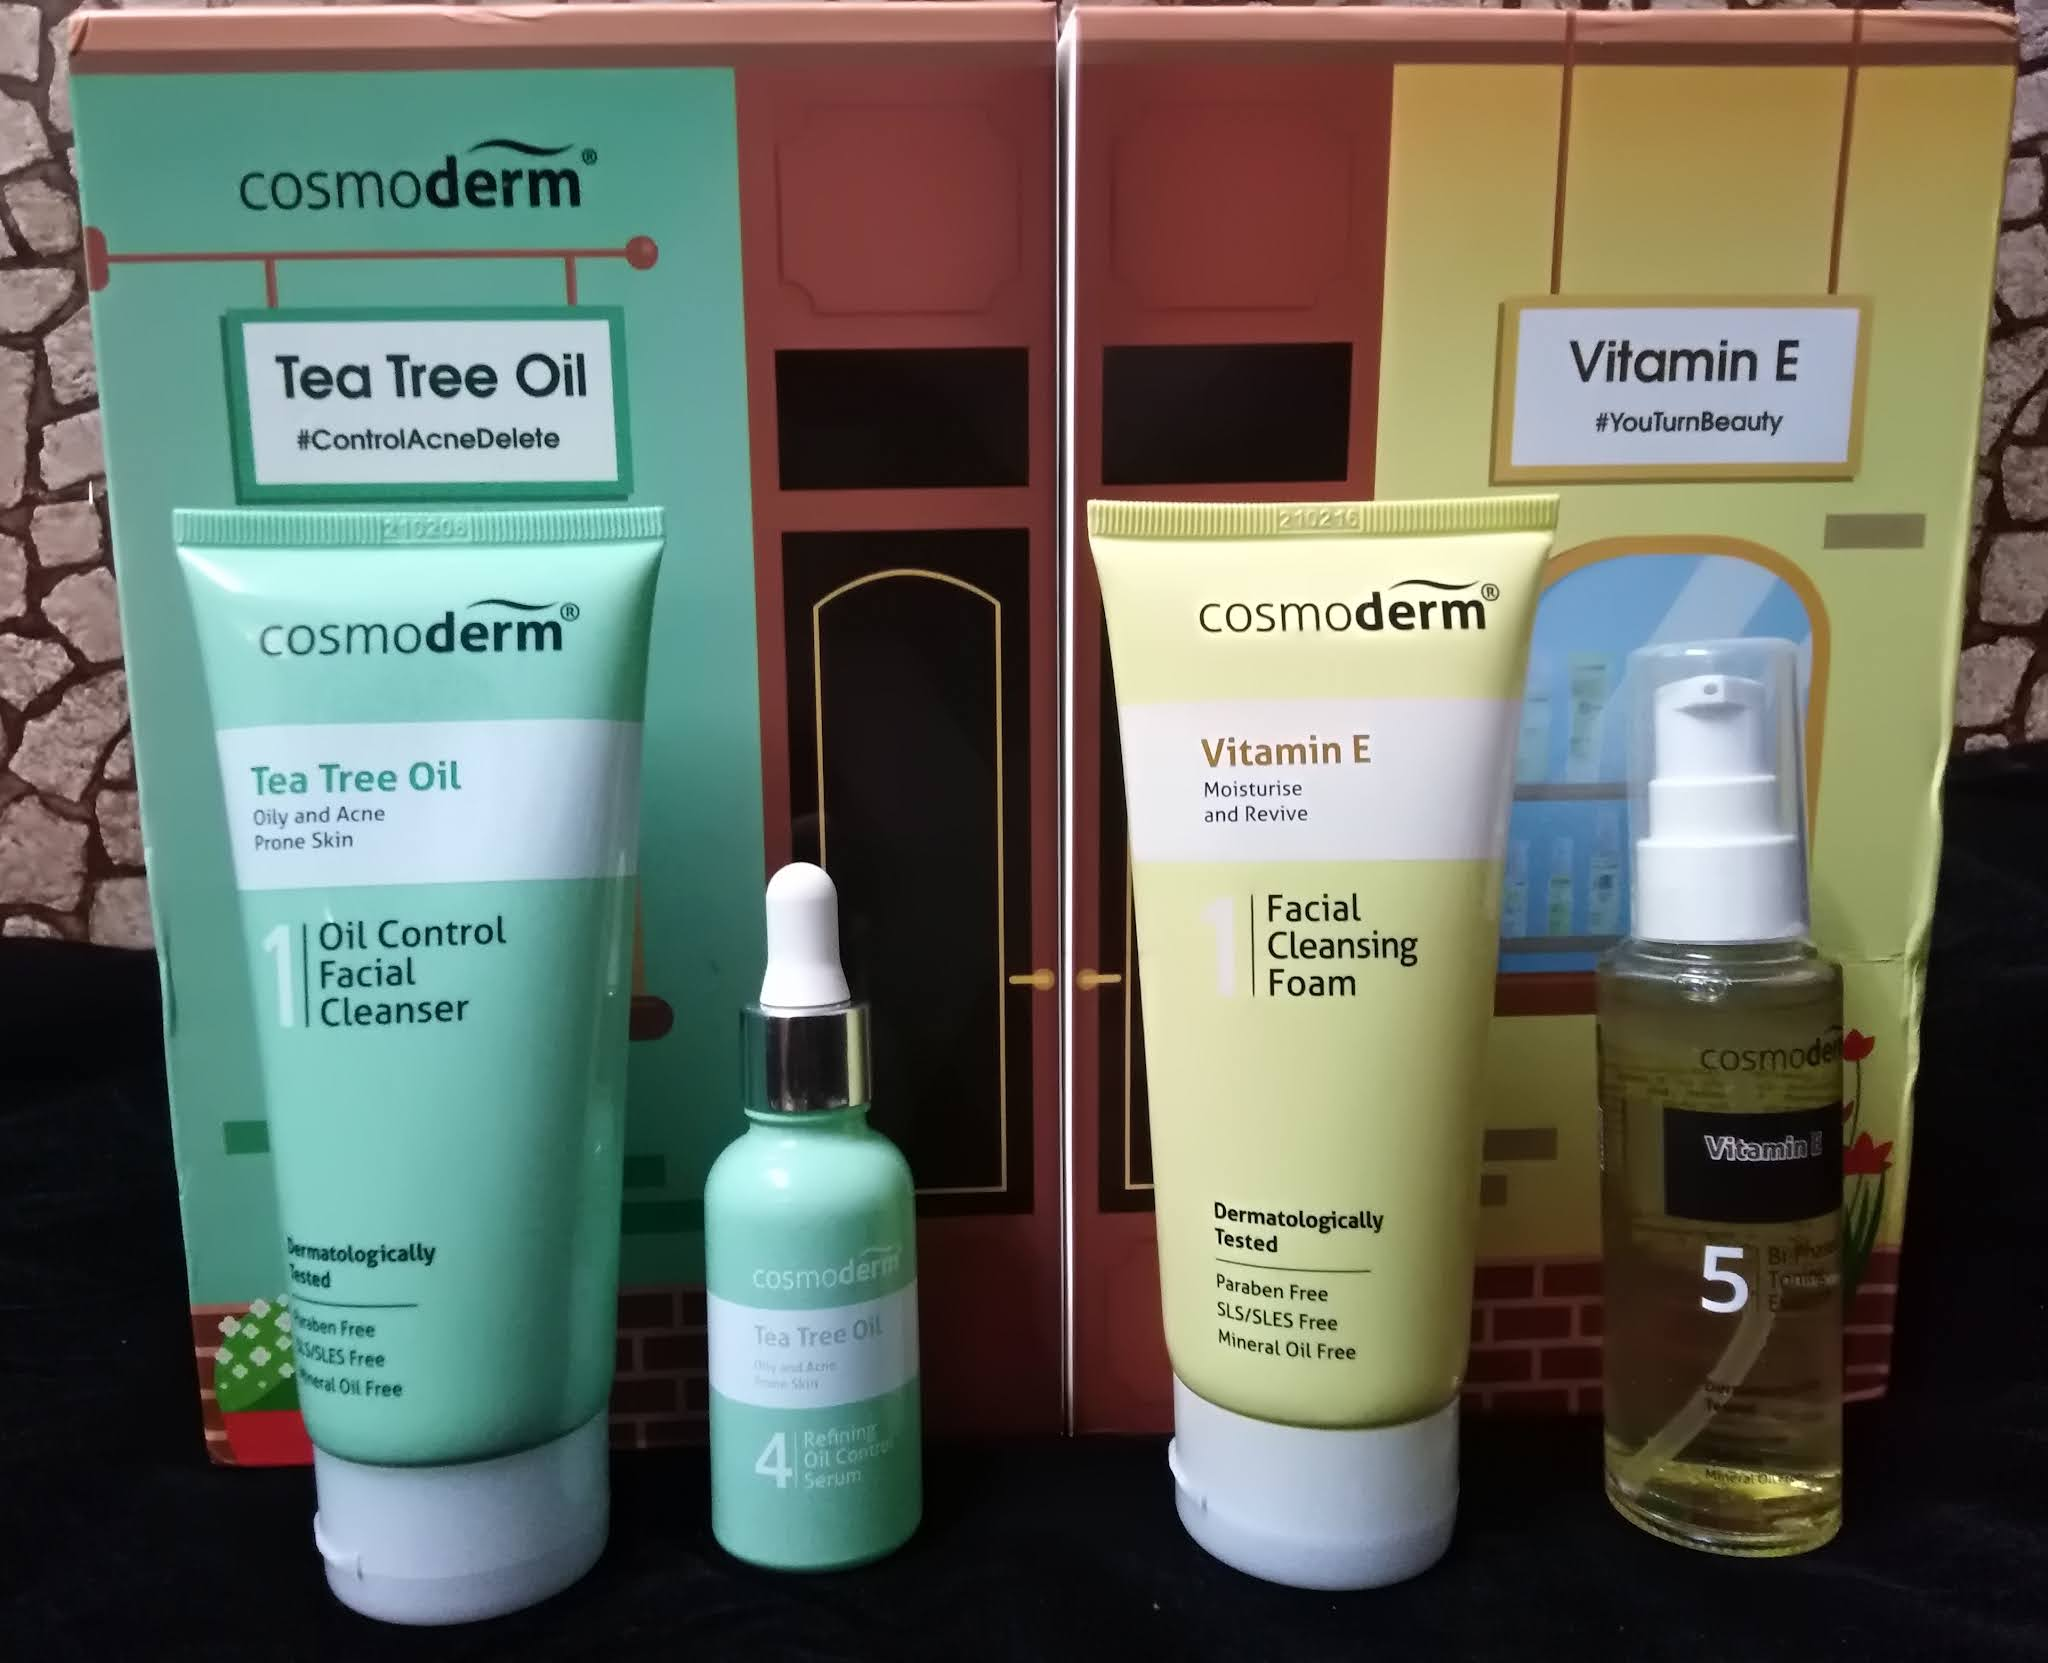 Hindari Masalah Jerawat Dan Parut Jerawat Dengan Cosmoderm Vitamin E dan Tea Tree Oil